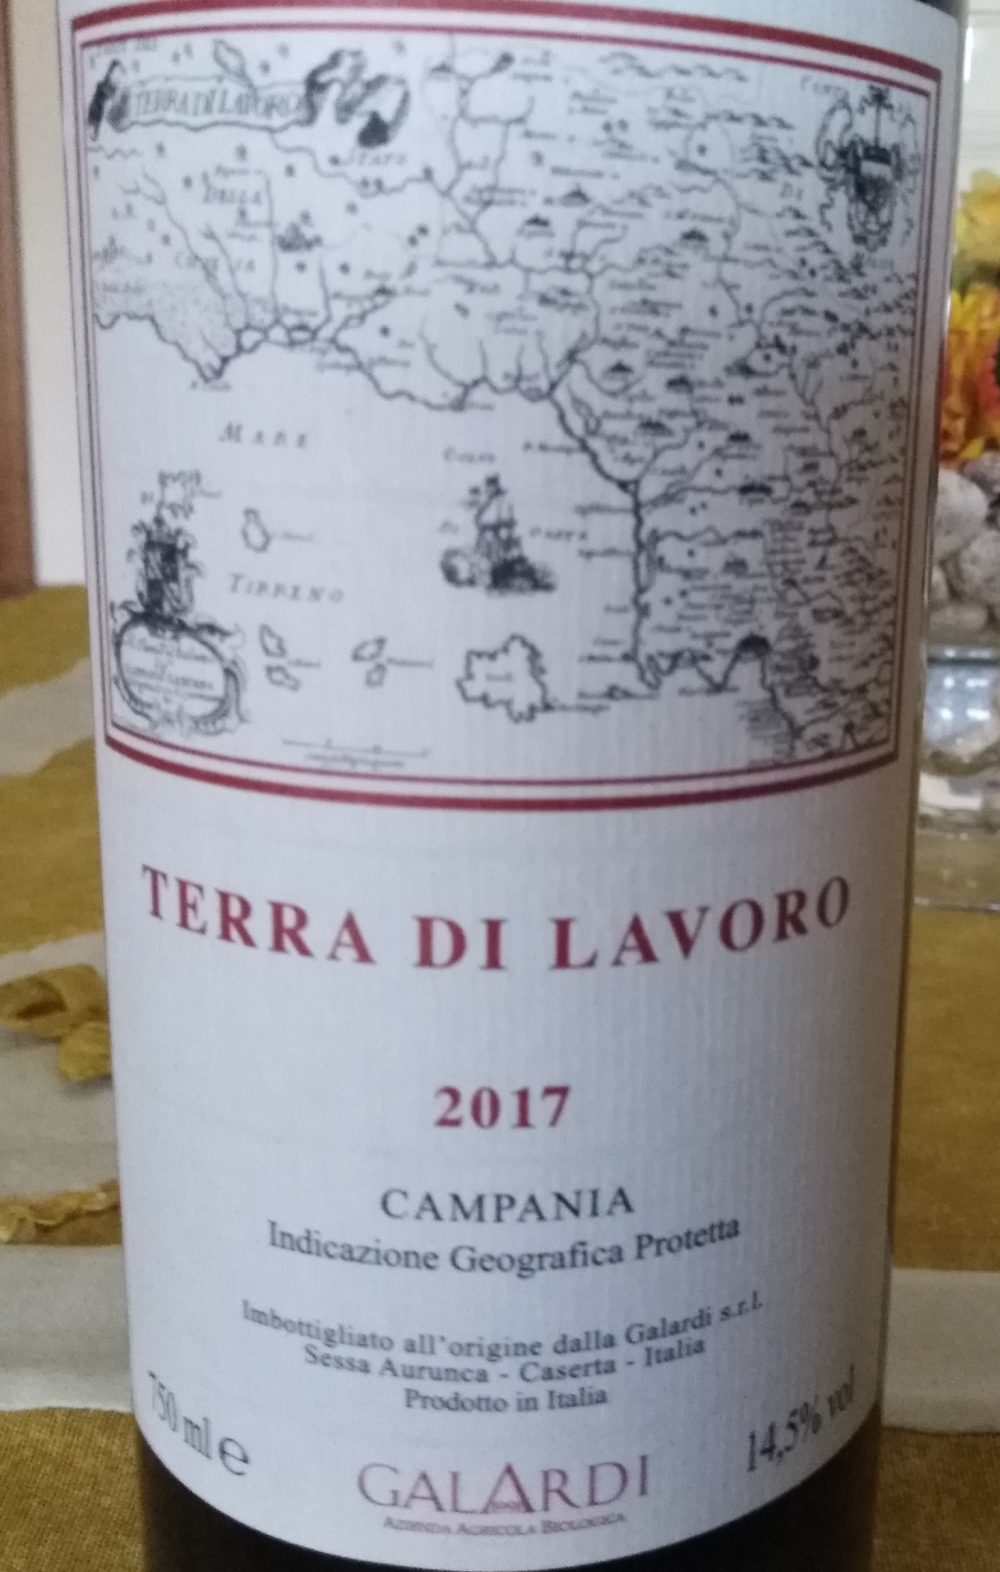 Terra di Lavoro Campania Igp 2017 Galardi